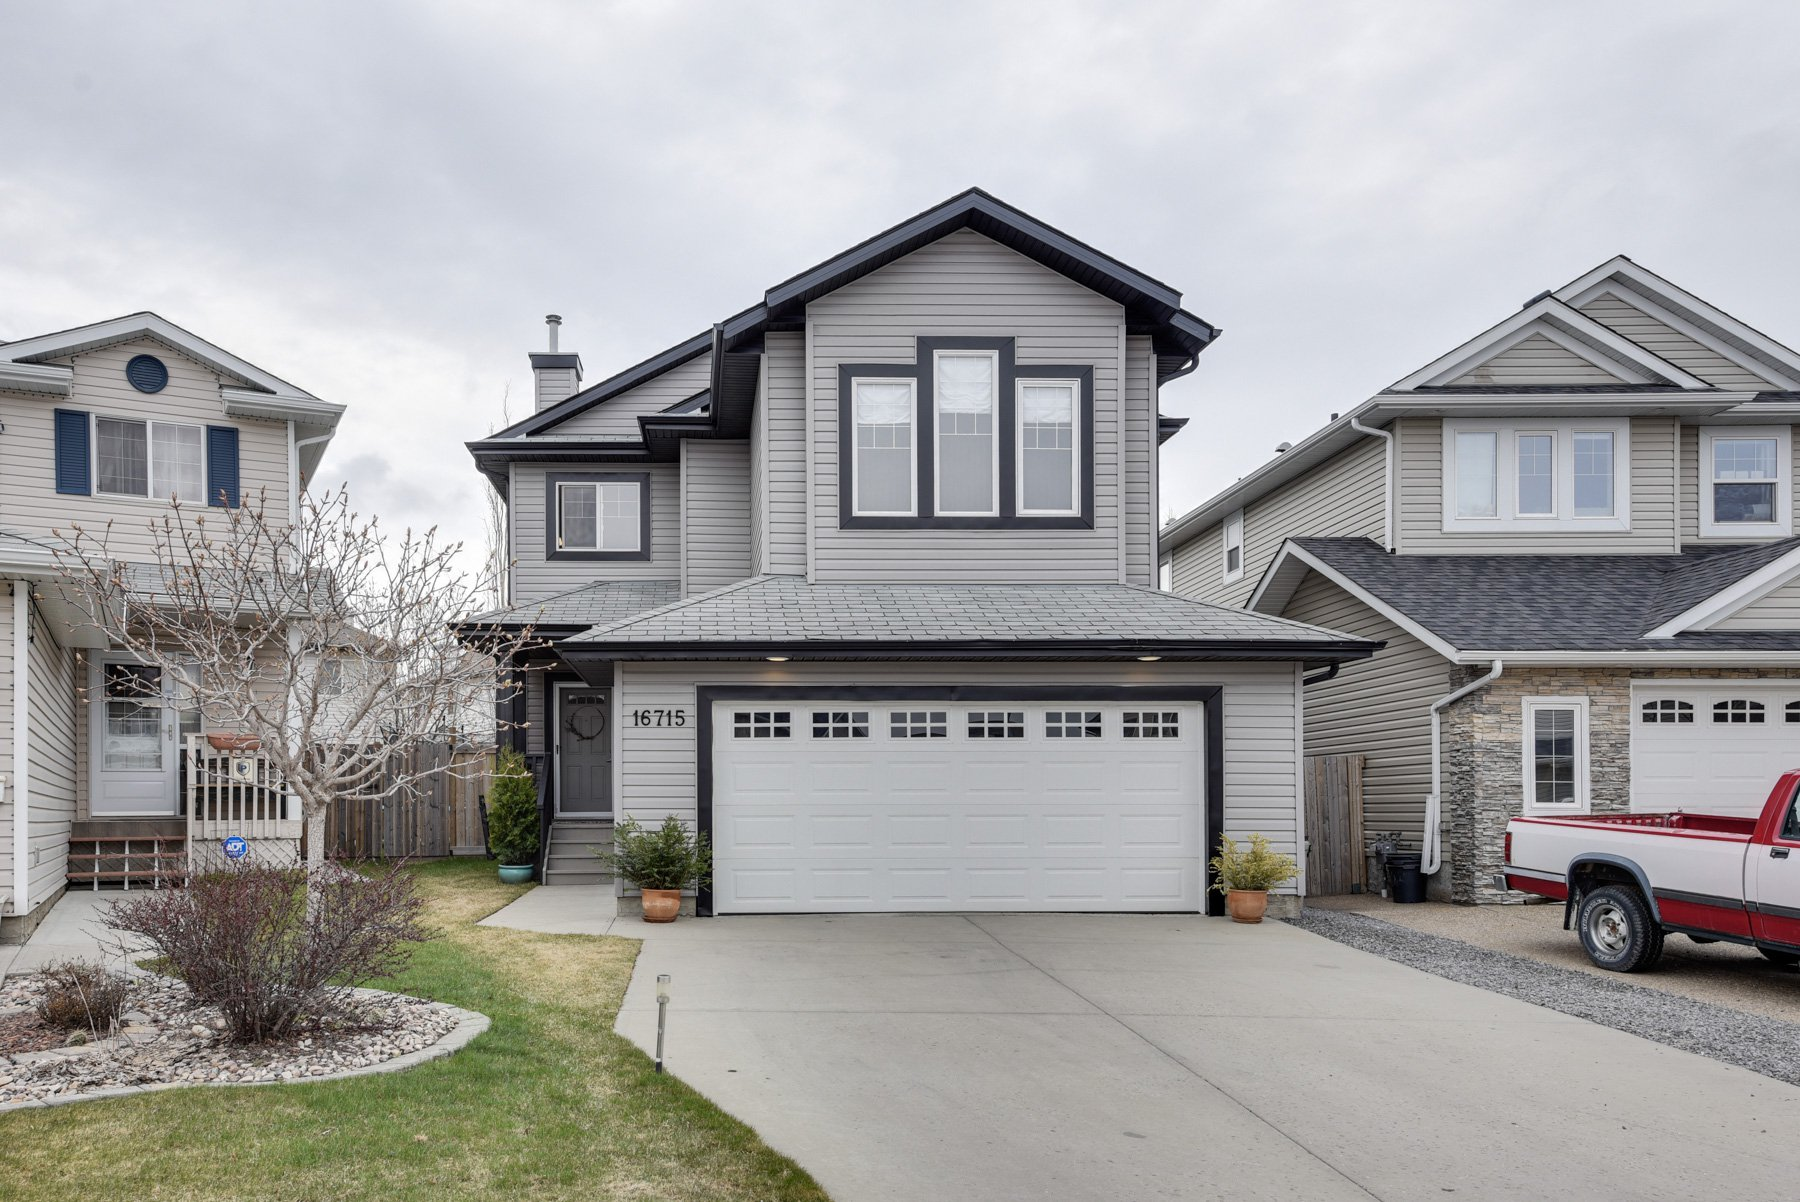 Main Photo: 16715 - 113 Street: Edmonton House for sale : MLS®# E4155746